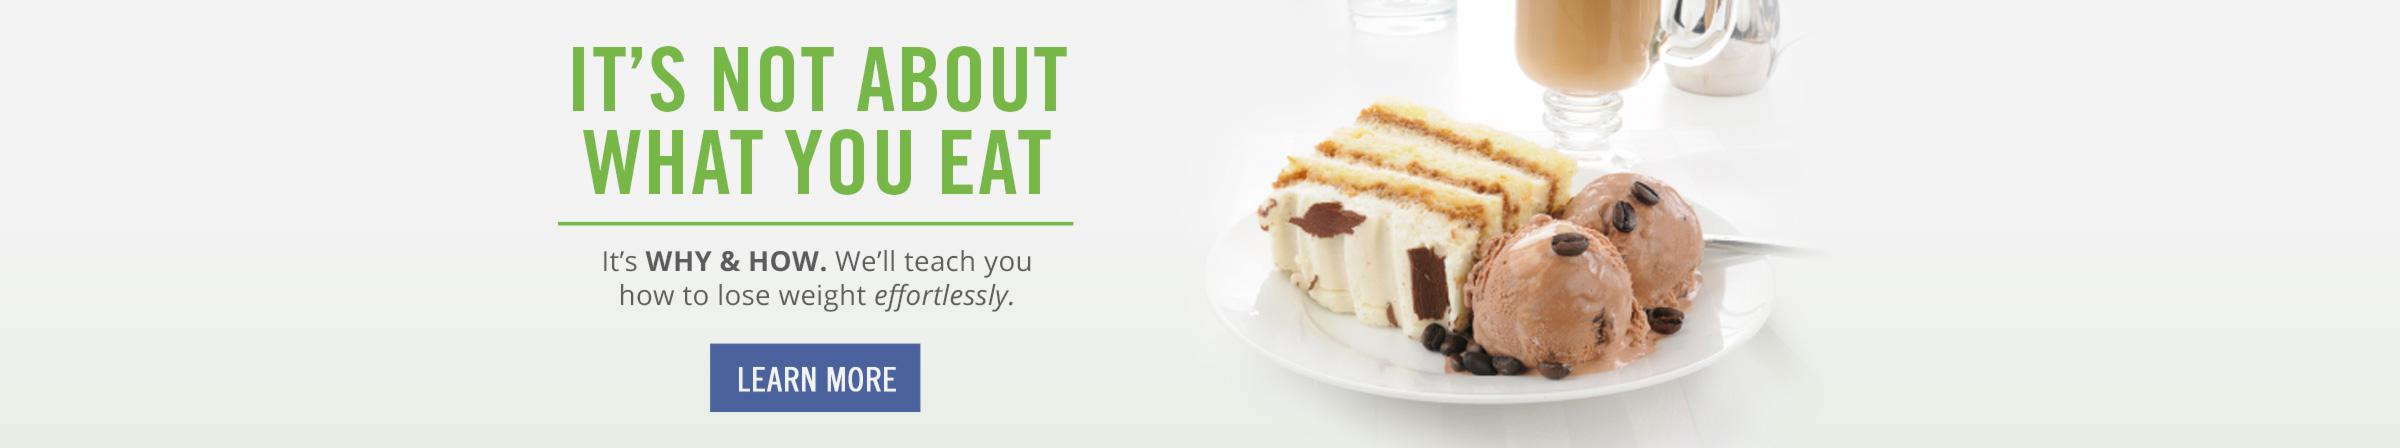 EatingReset-HomepageBanners-4